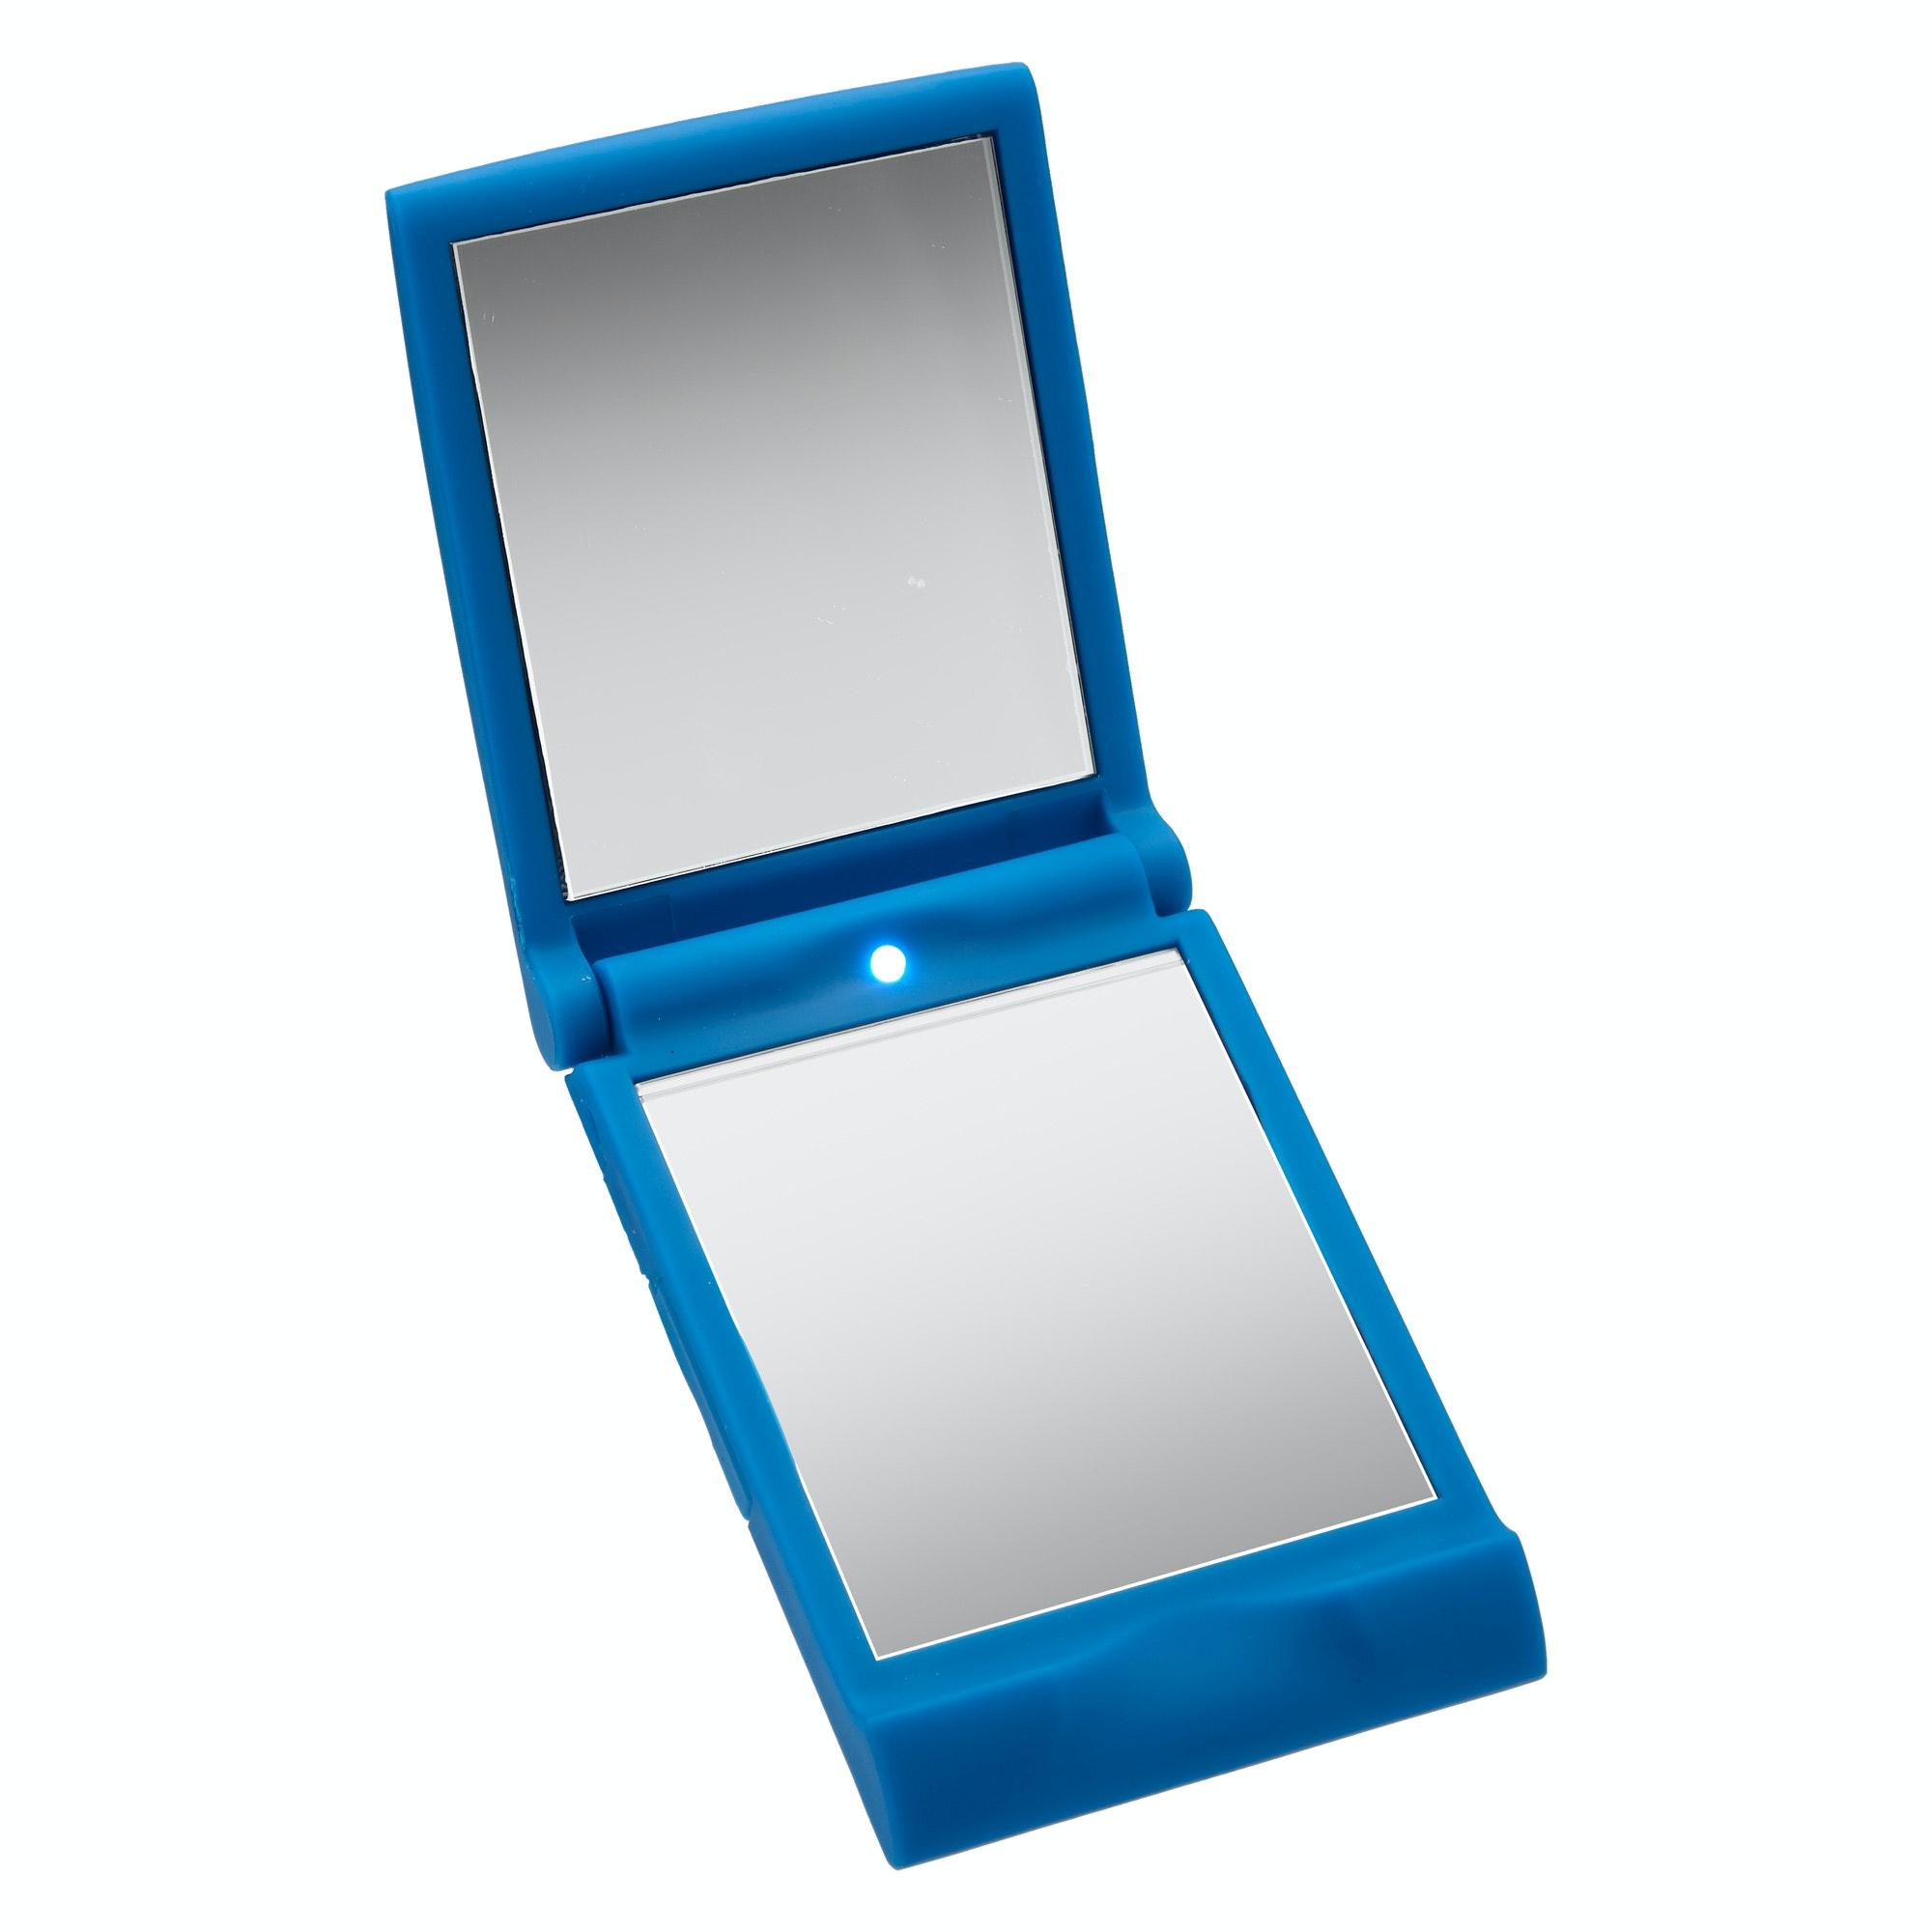 kathmandu travel mirror auto led light compact foldaway magnifying standing new ebay. Black Bedroom Furniture Sets. Home Design Ideas